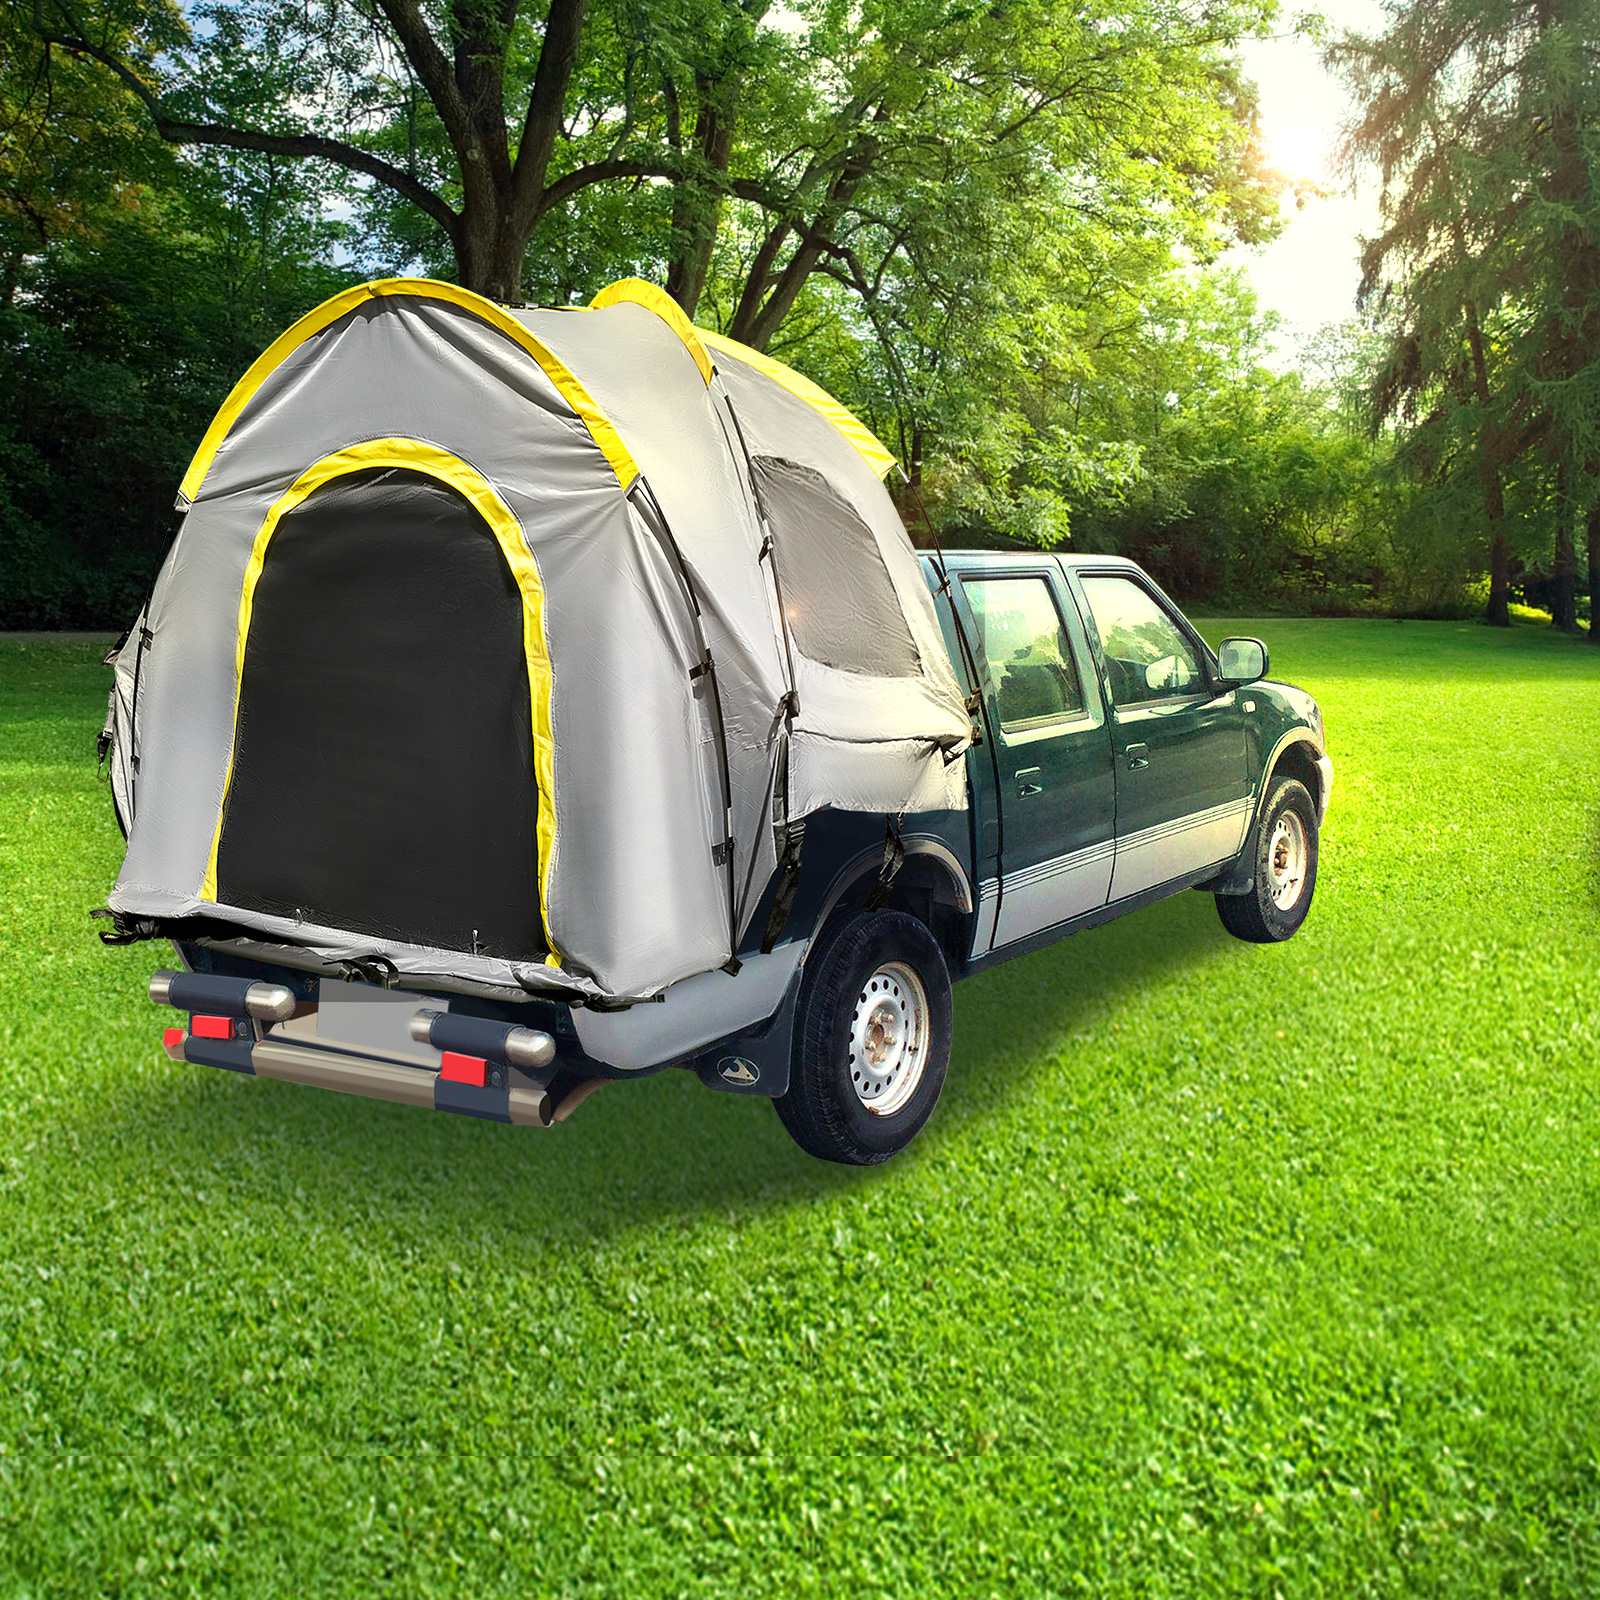 thumbnail 36 - VEVOR Truck Tent Truck Bed Tent 5' - 8' Pickup Tent Waterproof Outdoor Camping